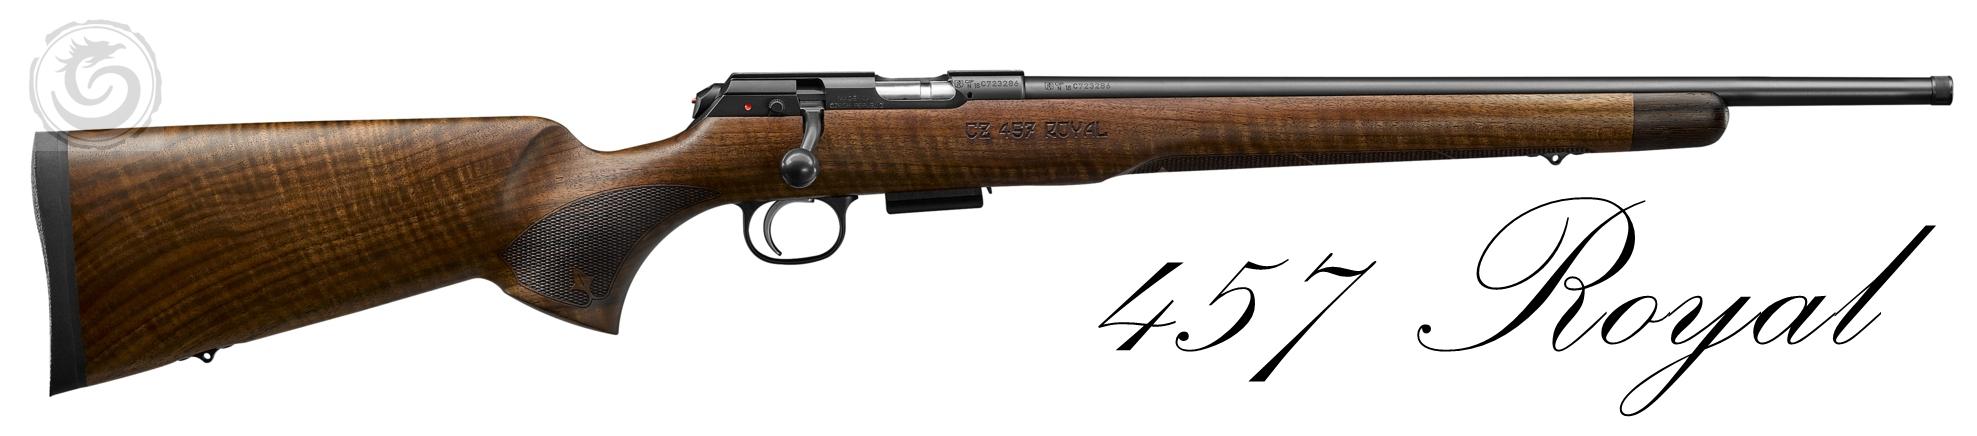 Cz 457 - AllFirearms - largest firearms price comparison portal